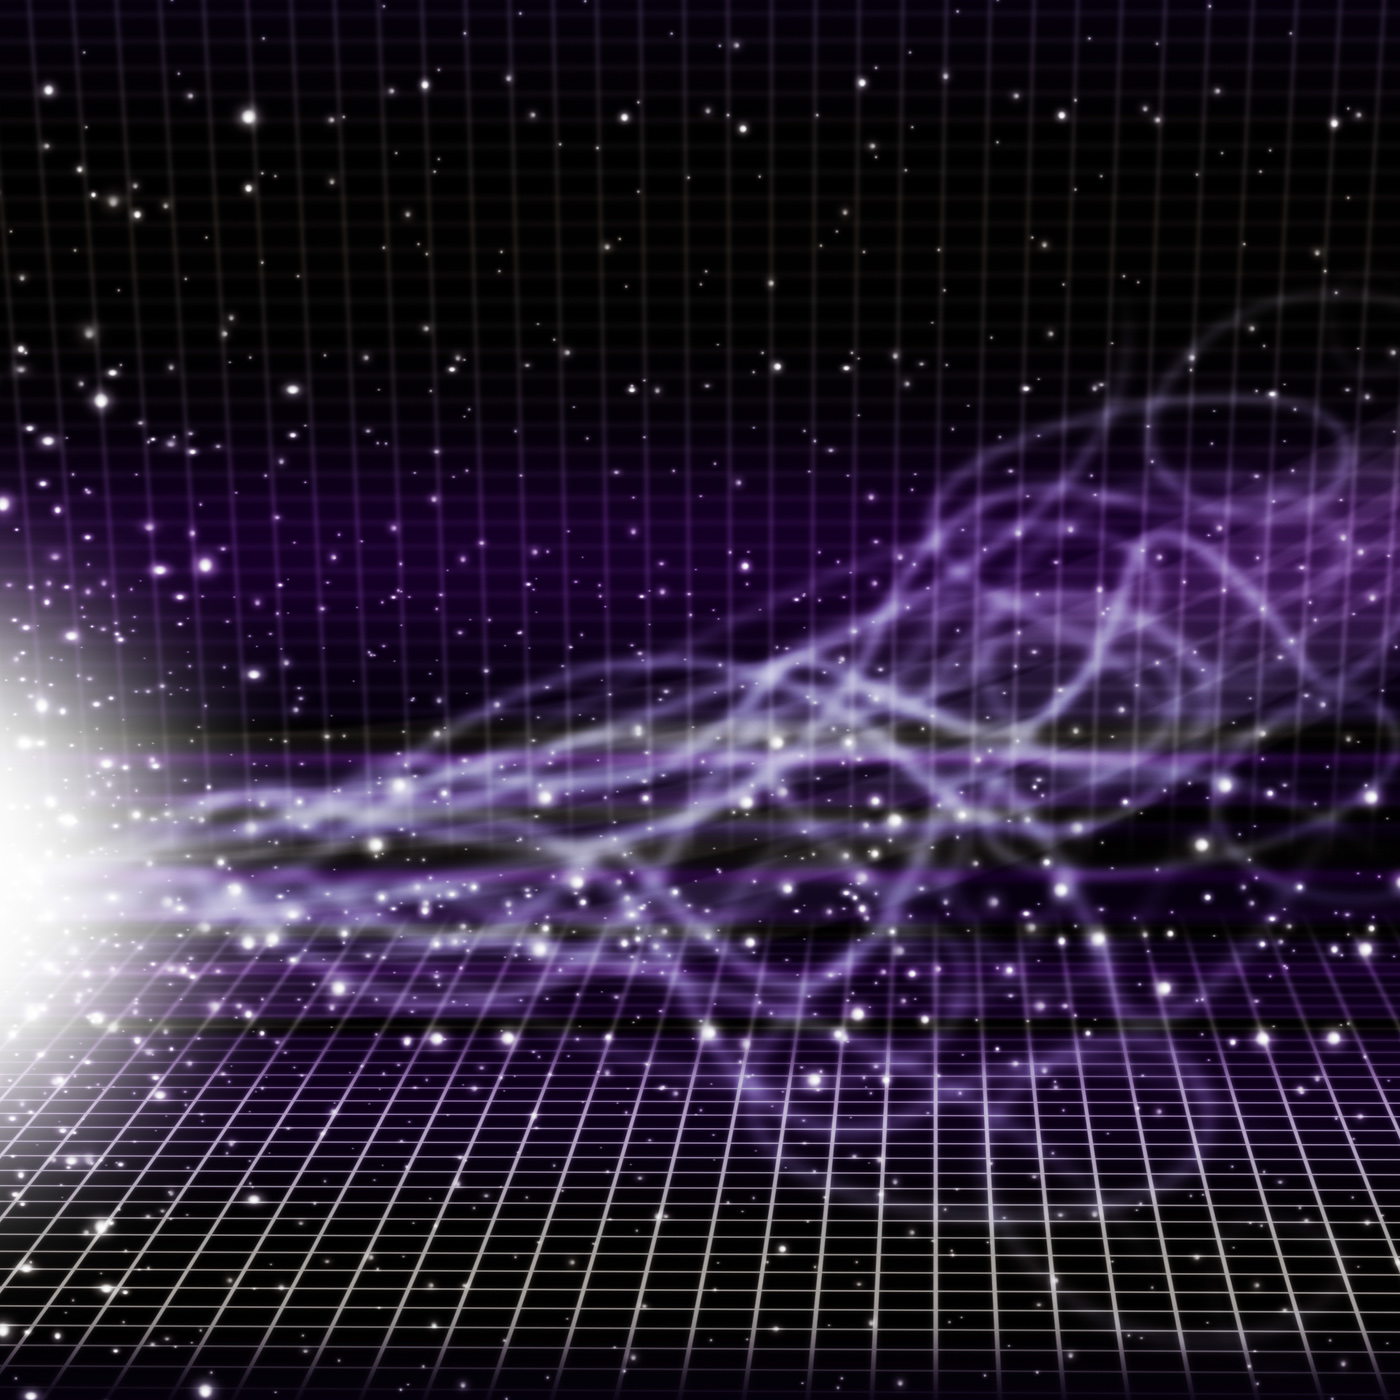 Sun space background shows transmitting solar energy photo